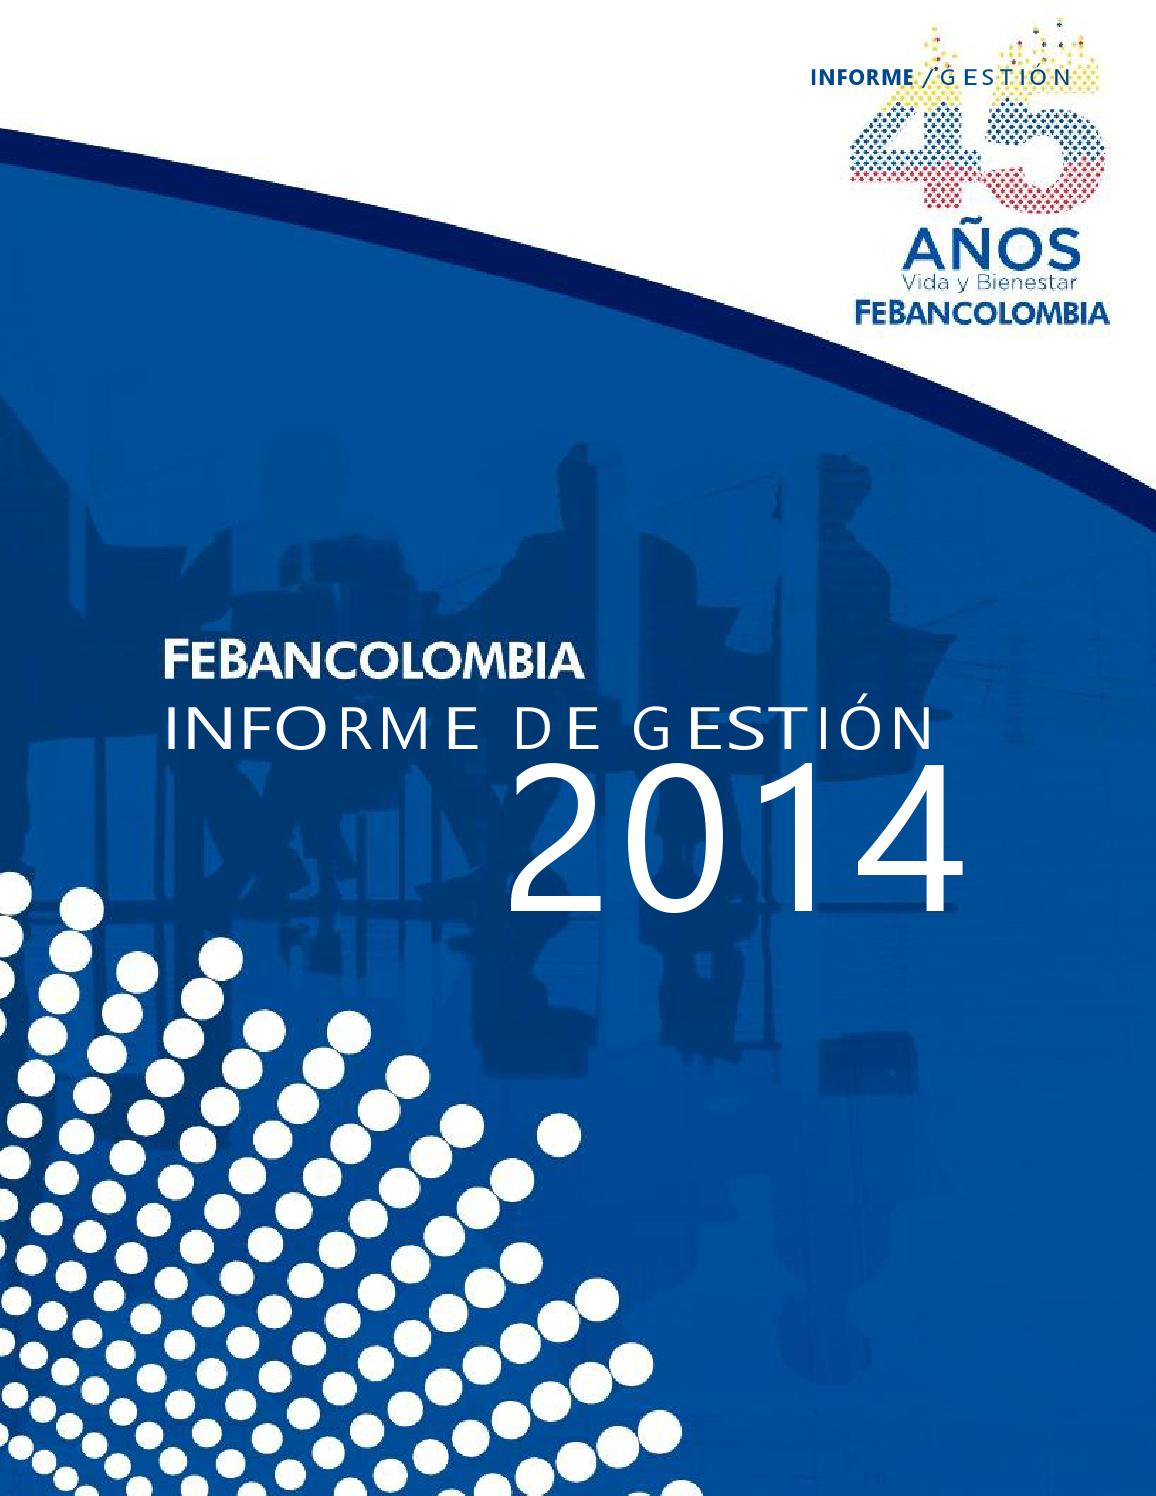 Febancolombia - Informe de Gestion by Sistemas - issuu